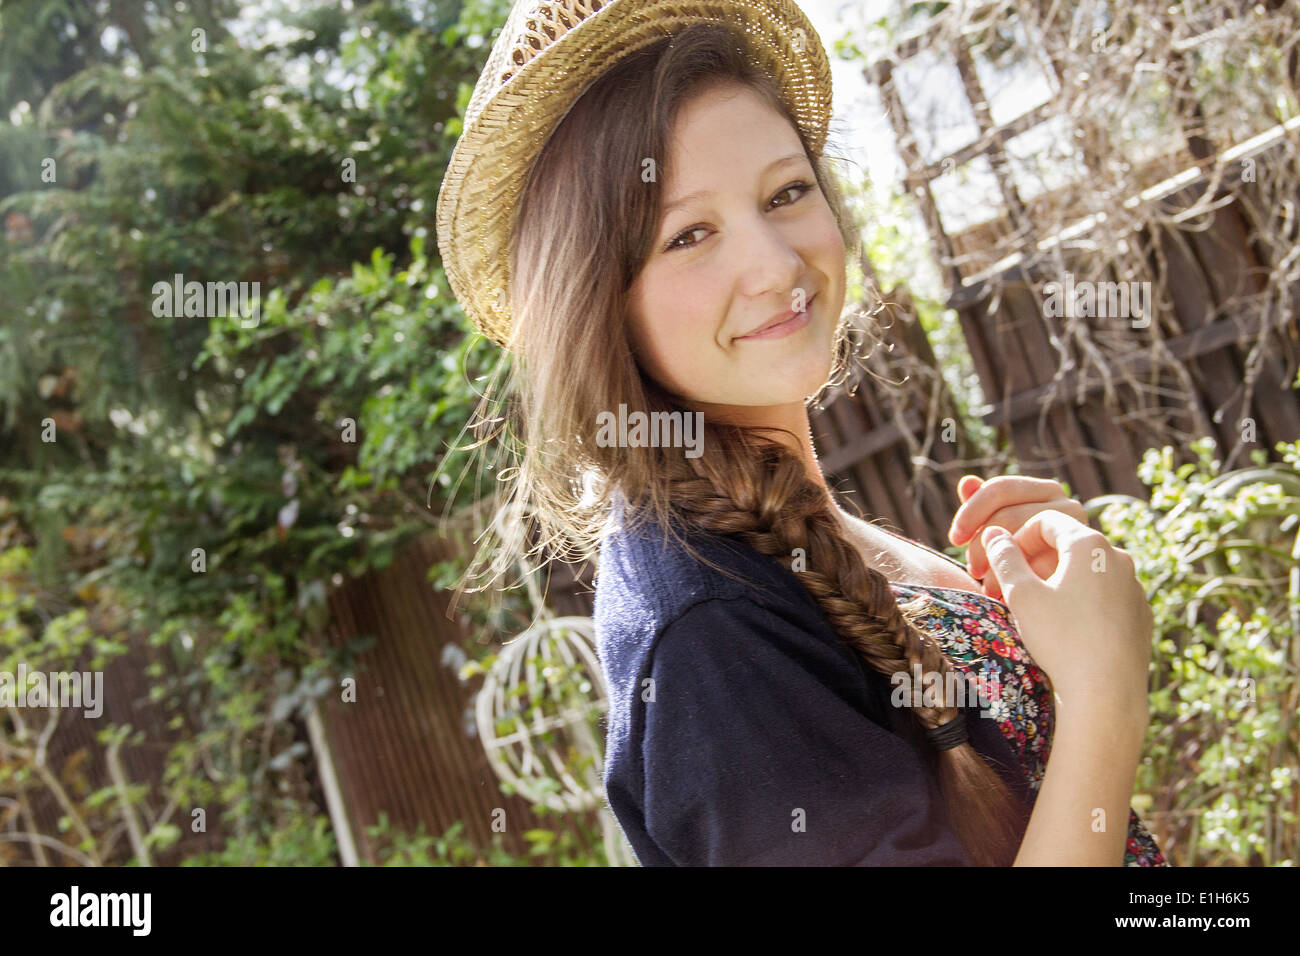 Portrait of teenage girl in straw hat in garden Photo Stock